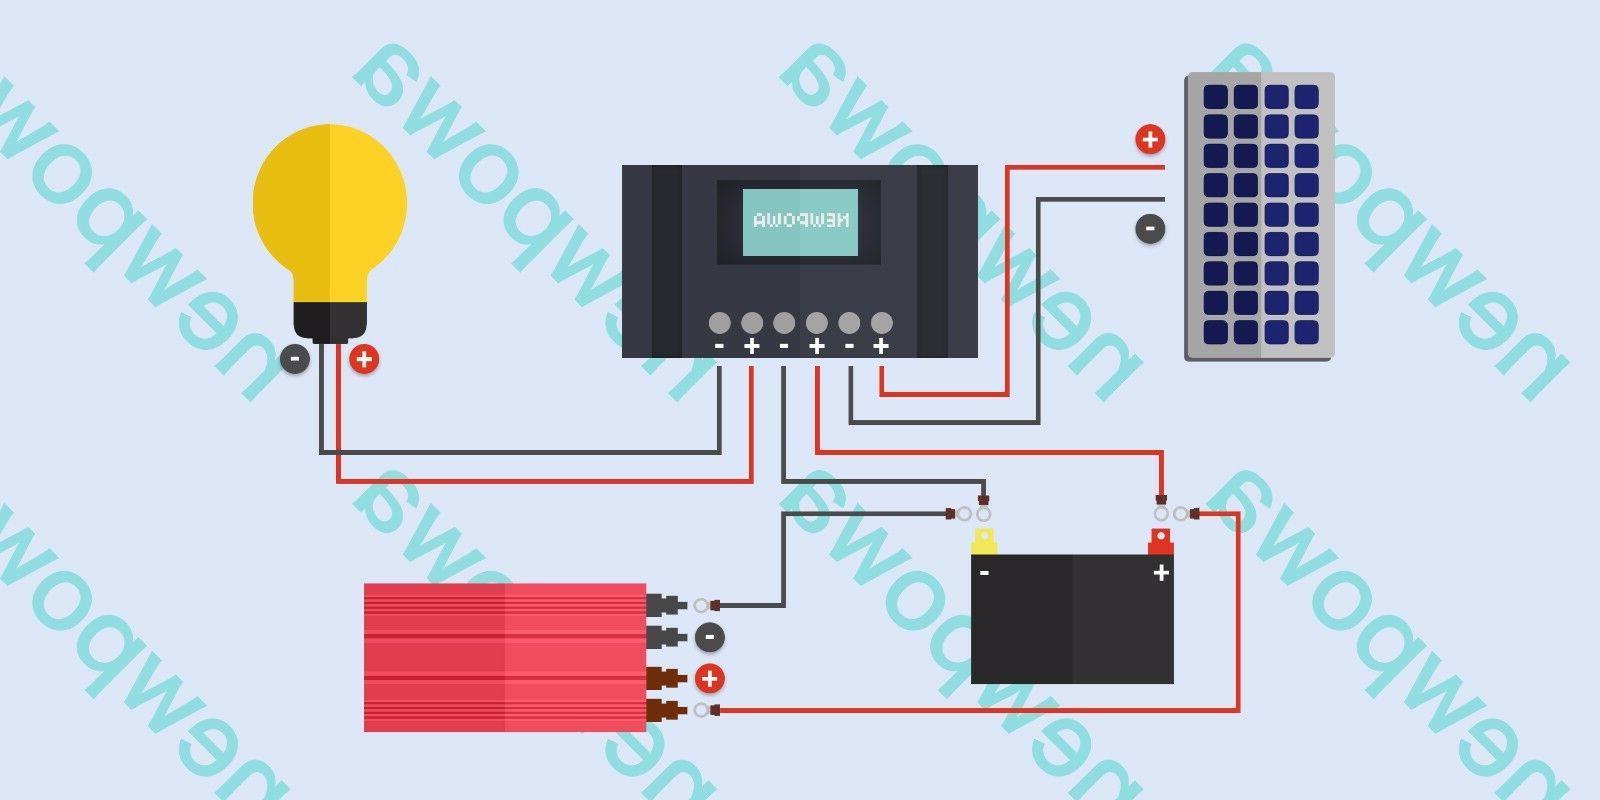 NewPowa 12V Panel High Effciency Module Watt RV